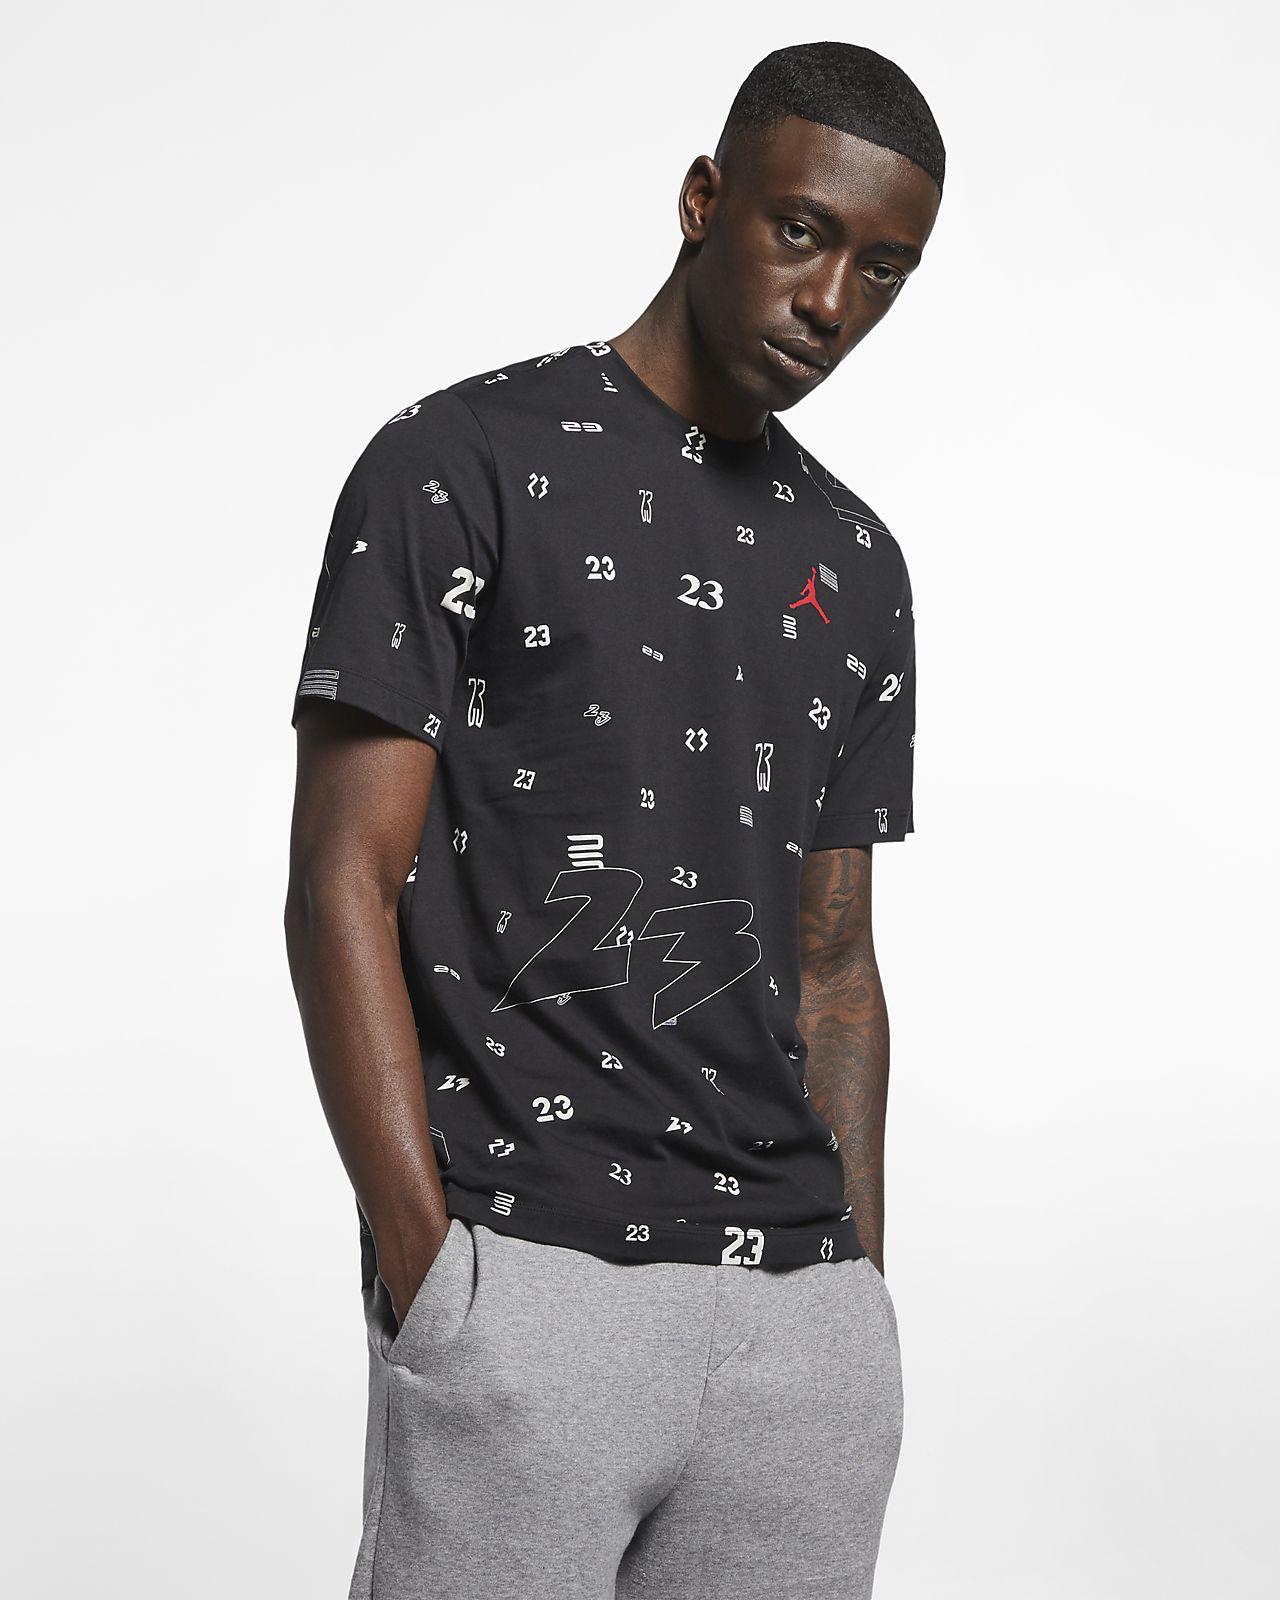 c92c2e30f75c3e Jordan 23 Men s Printed T-Shirt. Nike.com IN